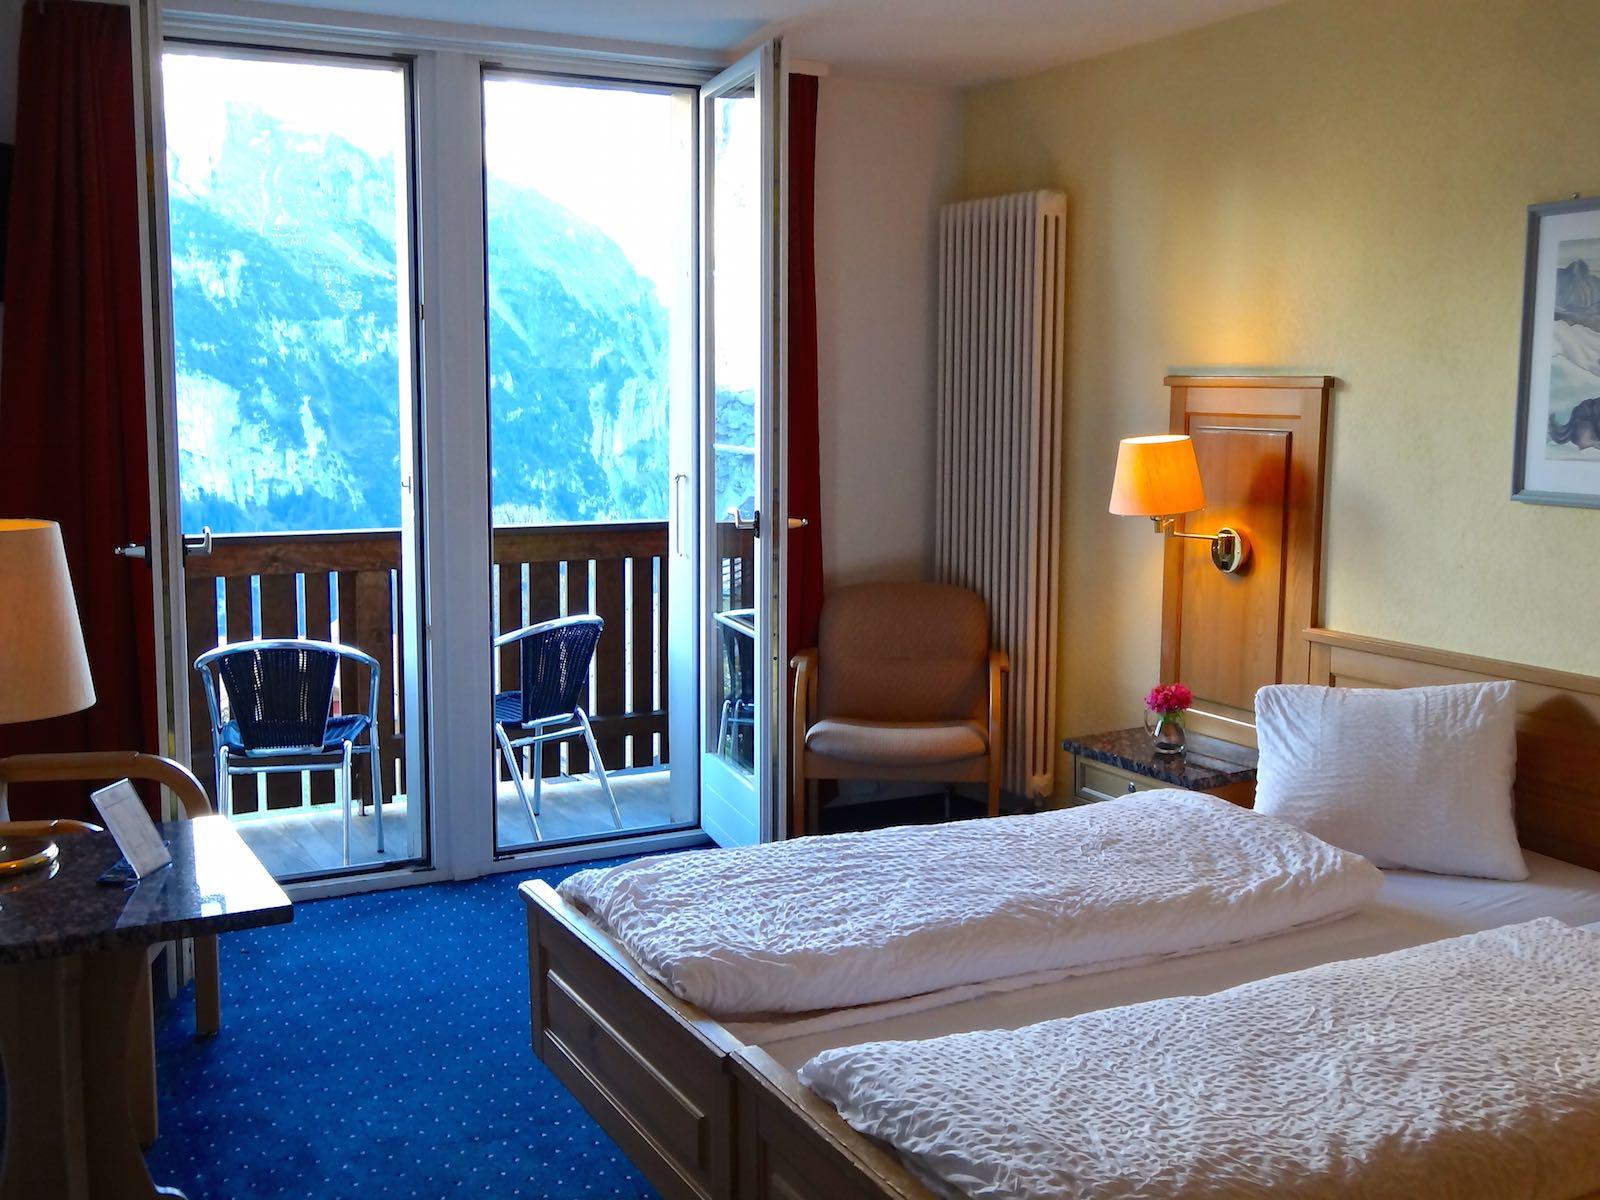 http://hoteljungfrau.ch/wp-content/uploads/2014/11/superior-zimmer-6.jpg